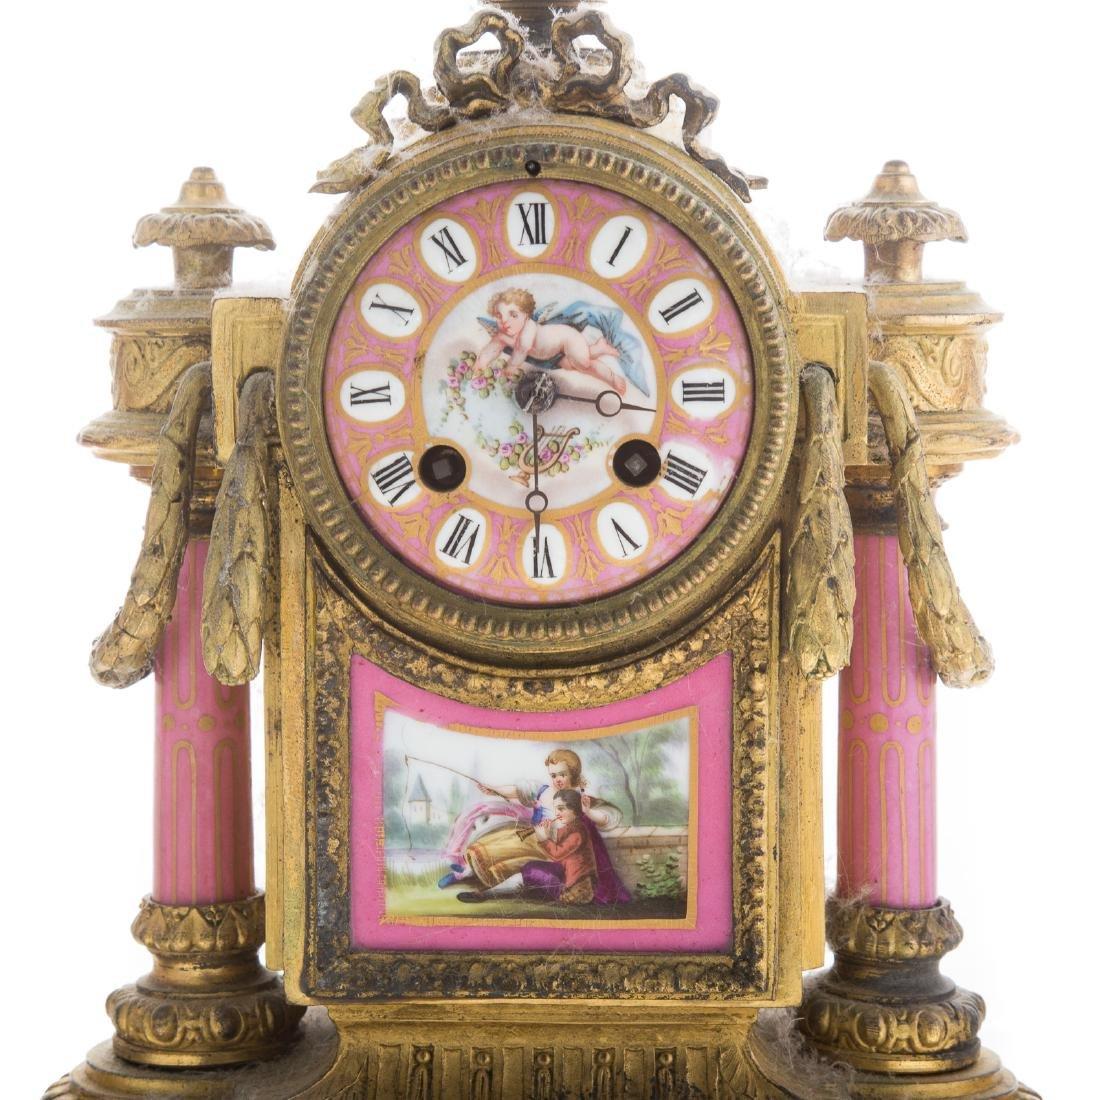 Phillipe H. Mourey gilt-metal clock garniture - 2